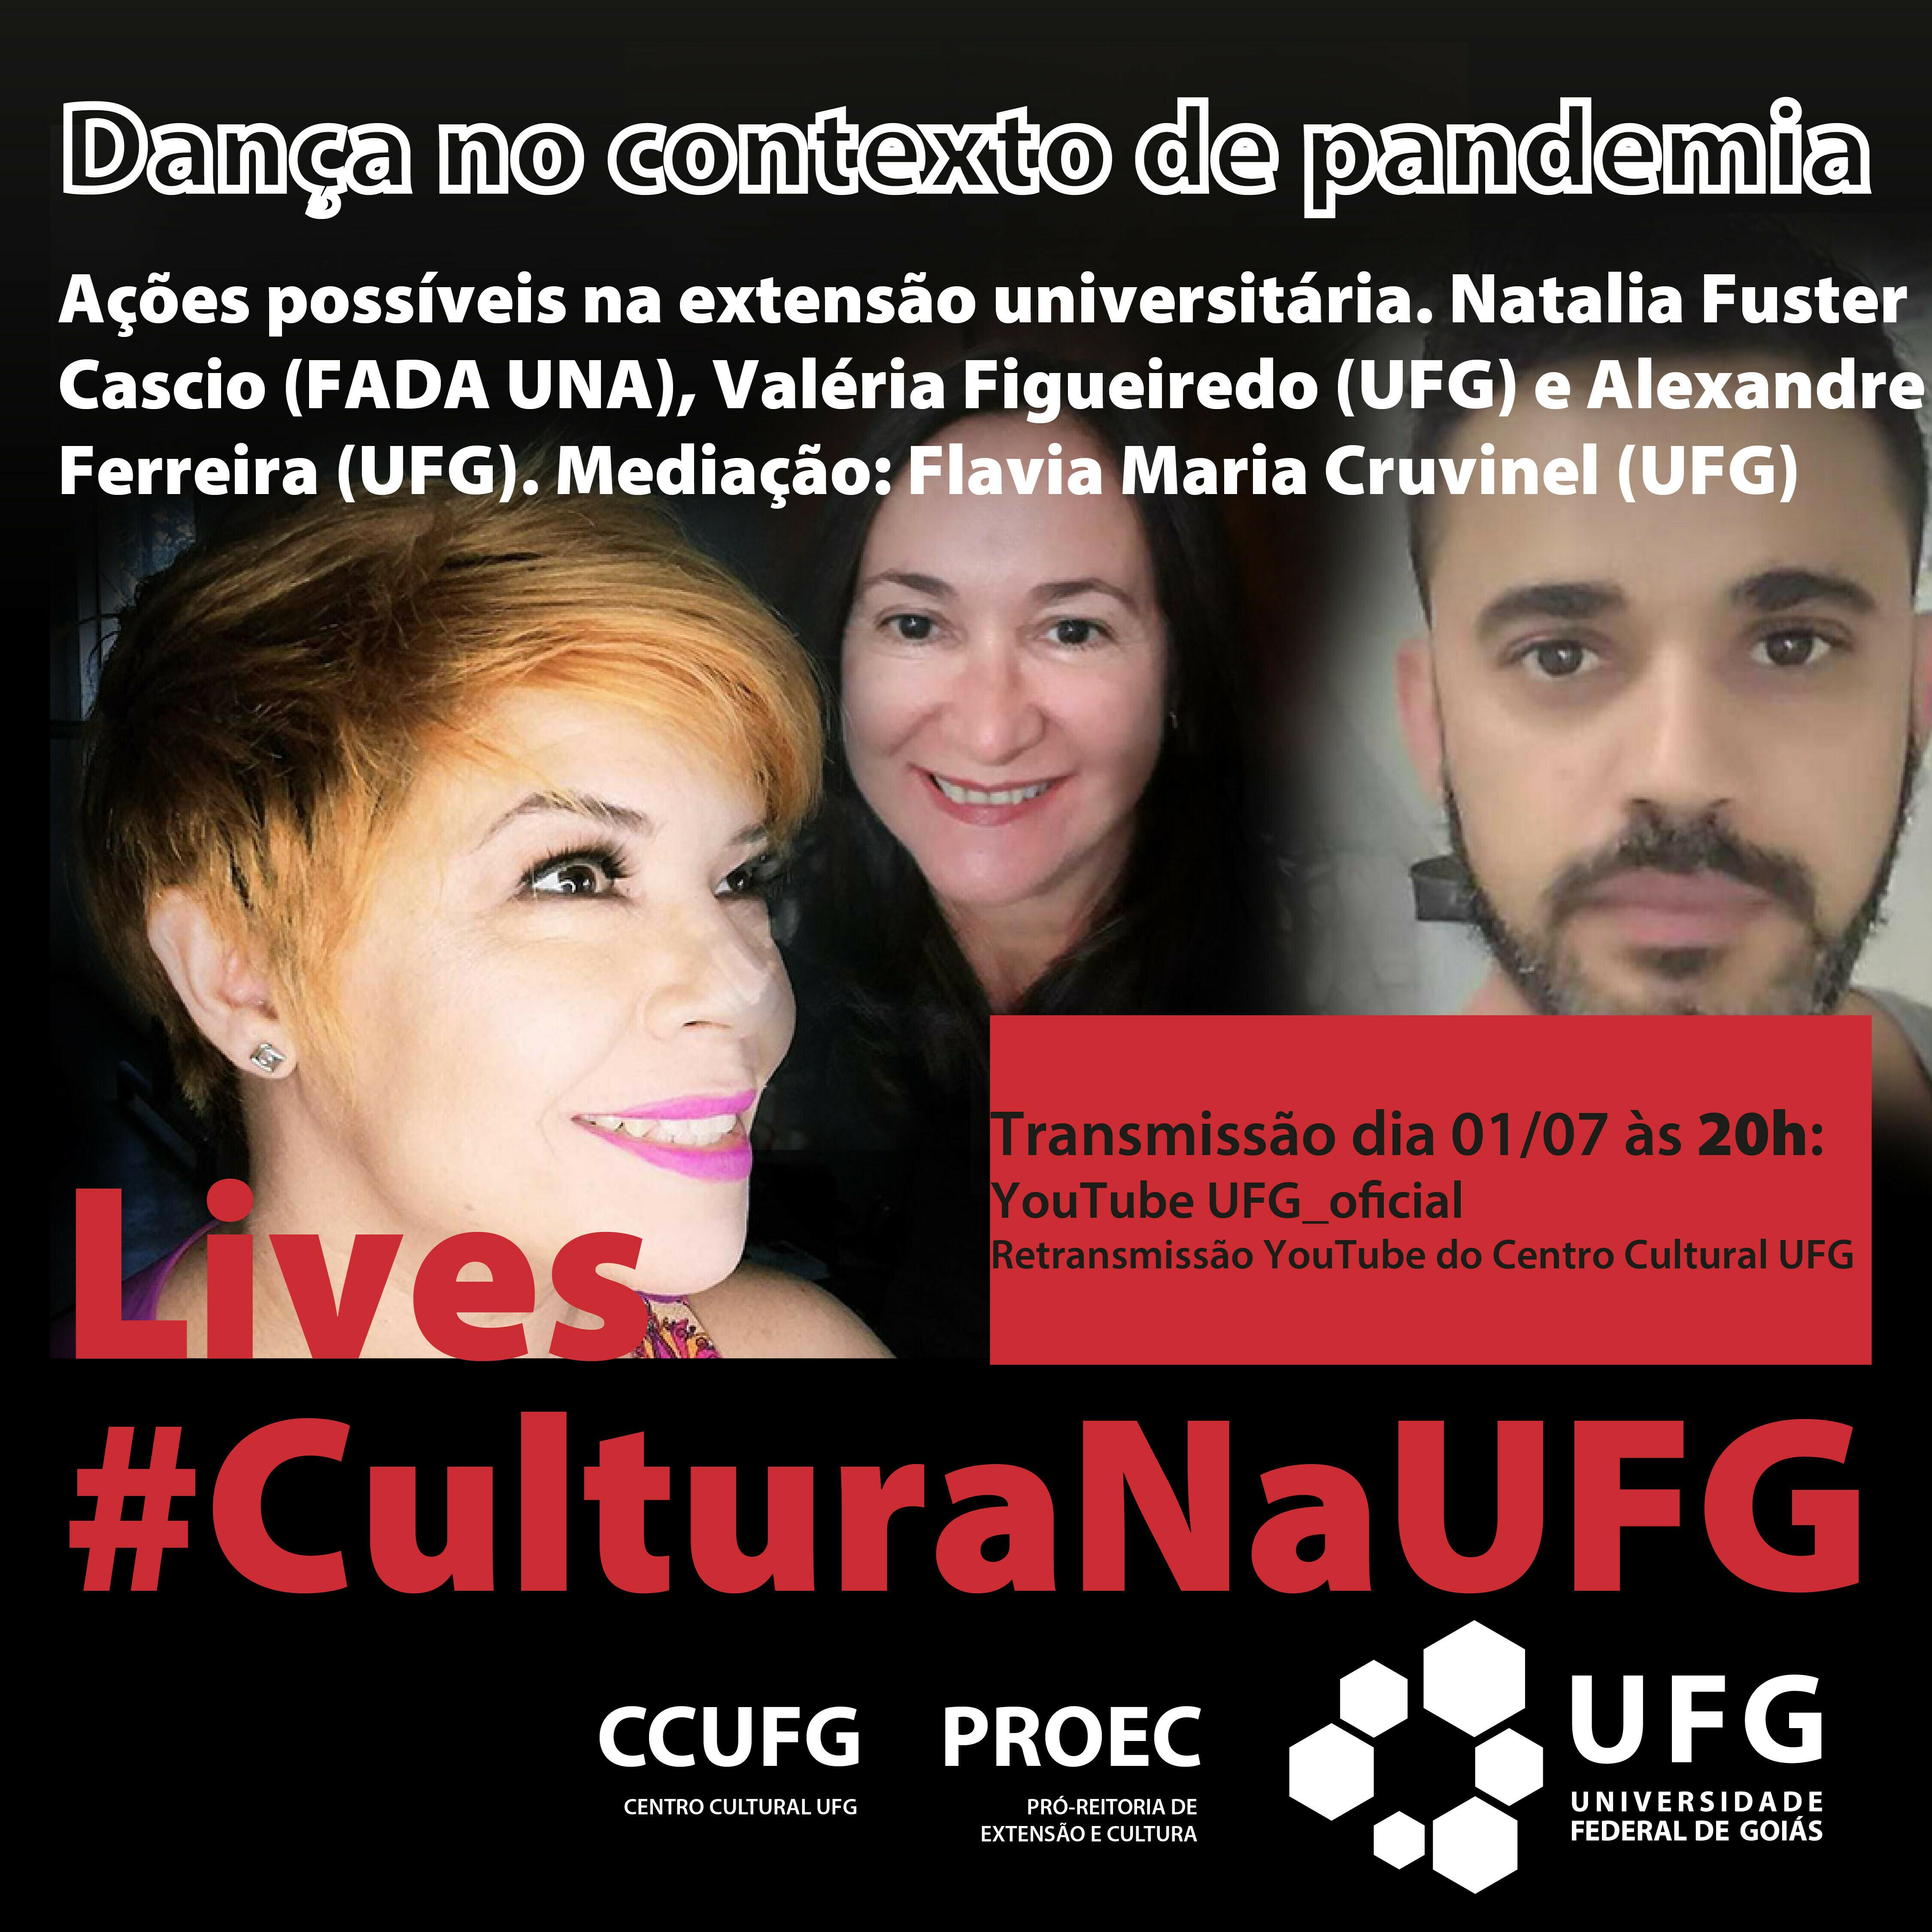 Lives__culturanaufg__Dança_no_contexto_de_pandemia__1080x1080px